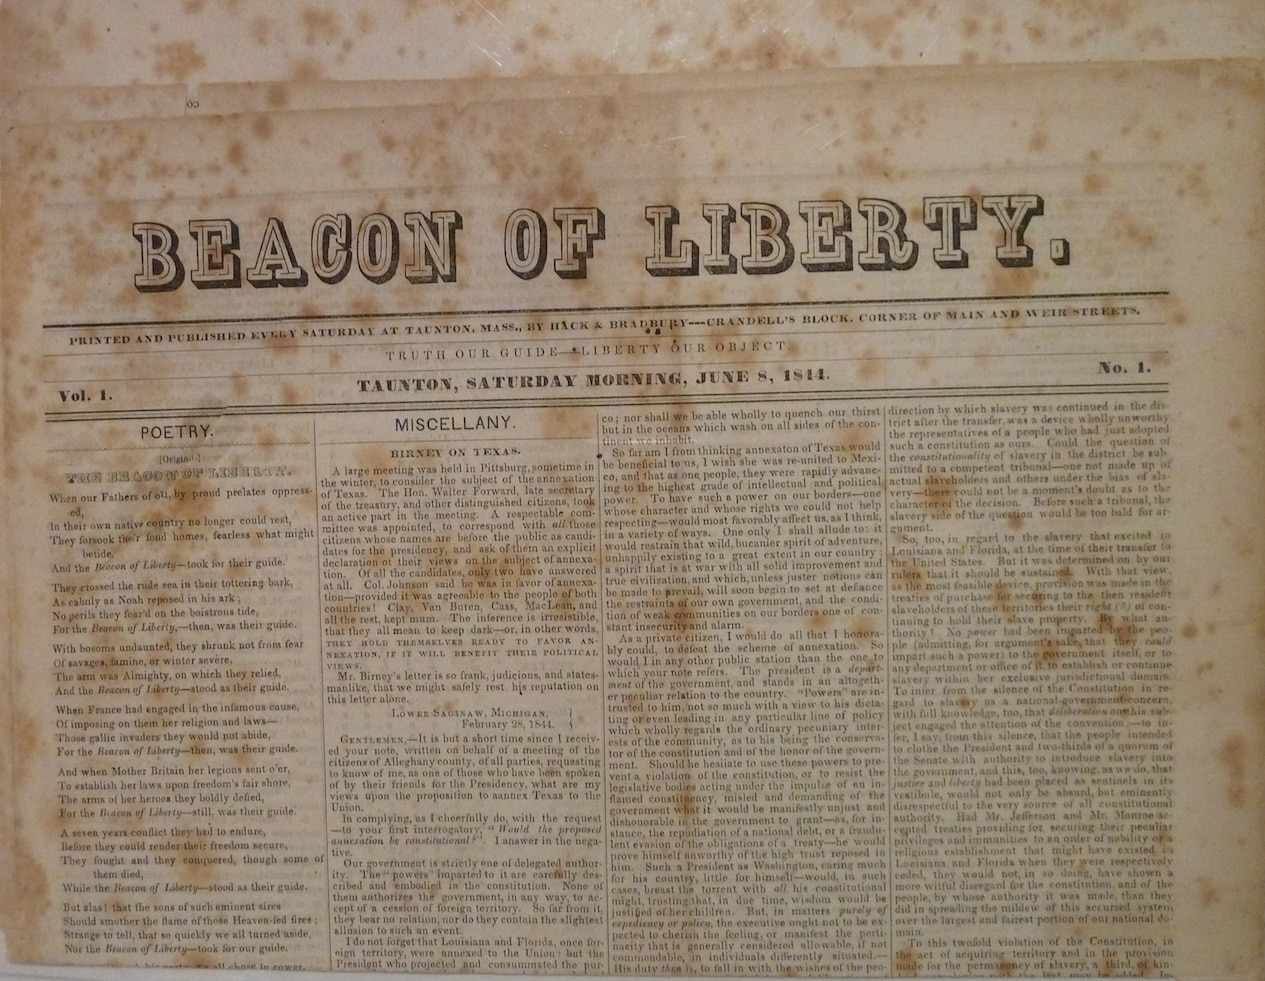 Beacon of Liberty